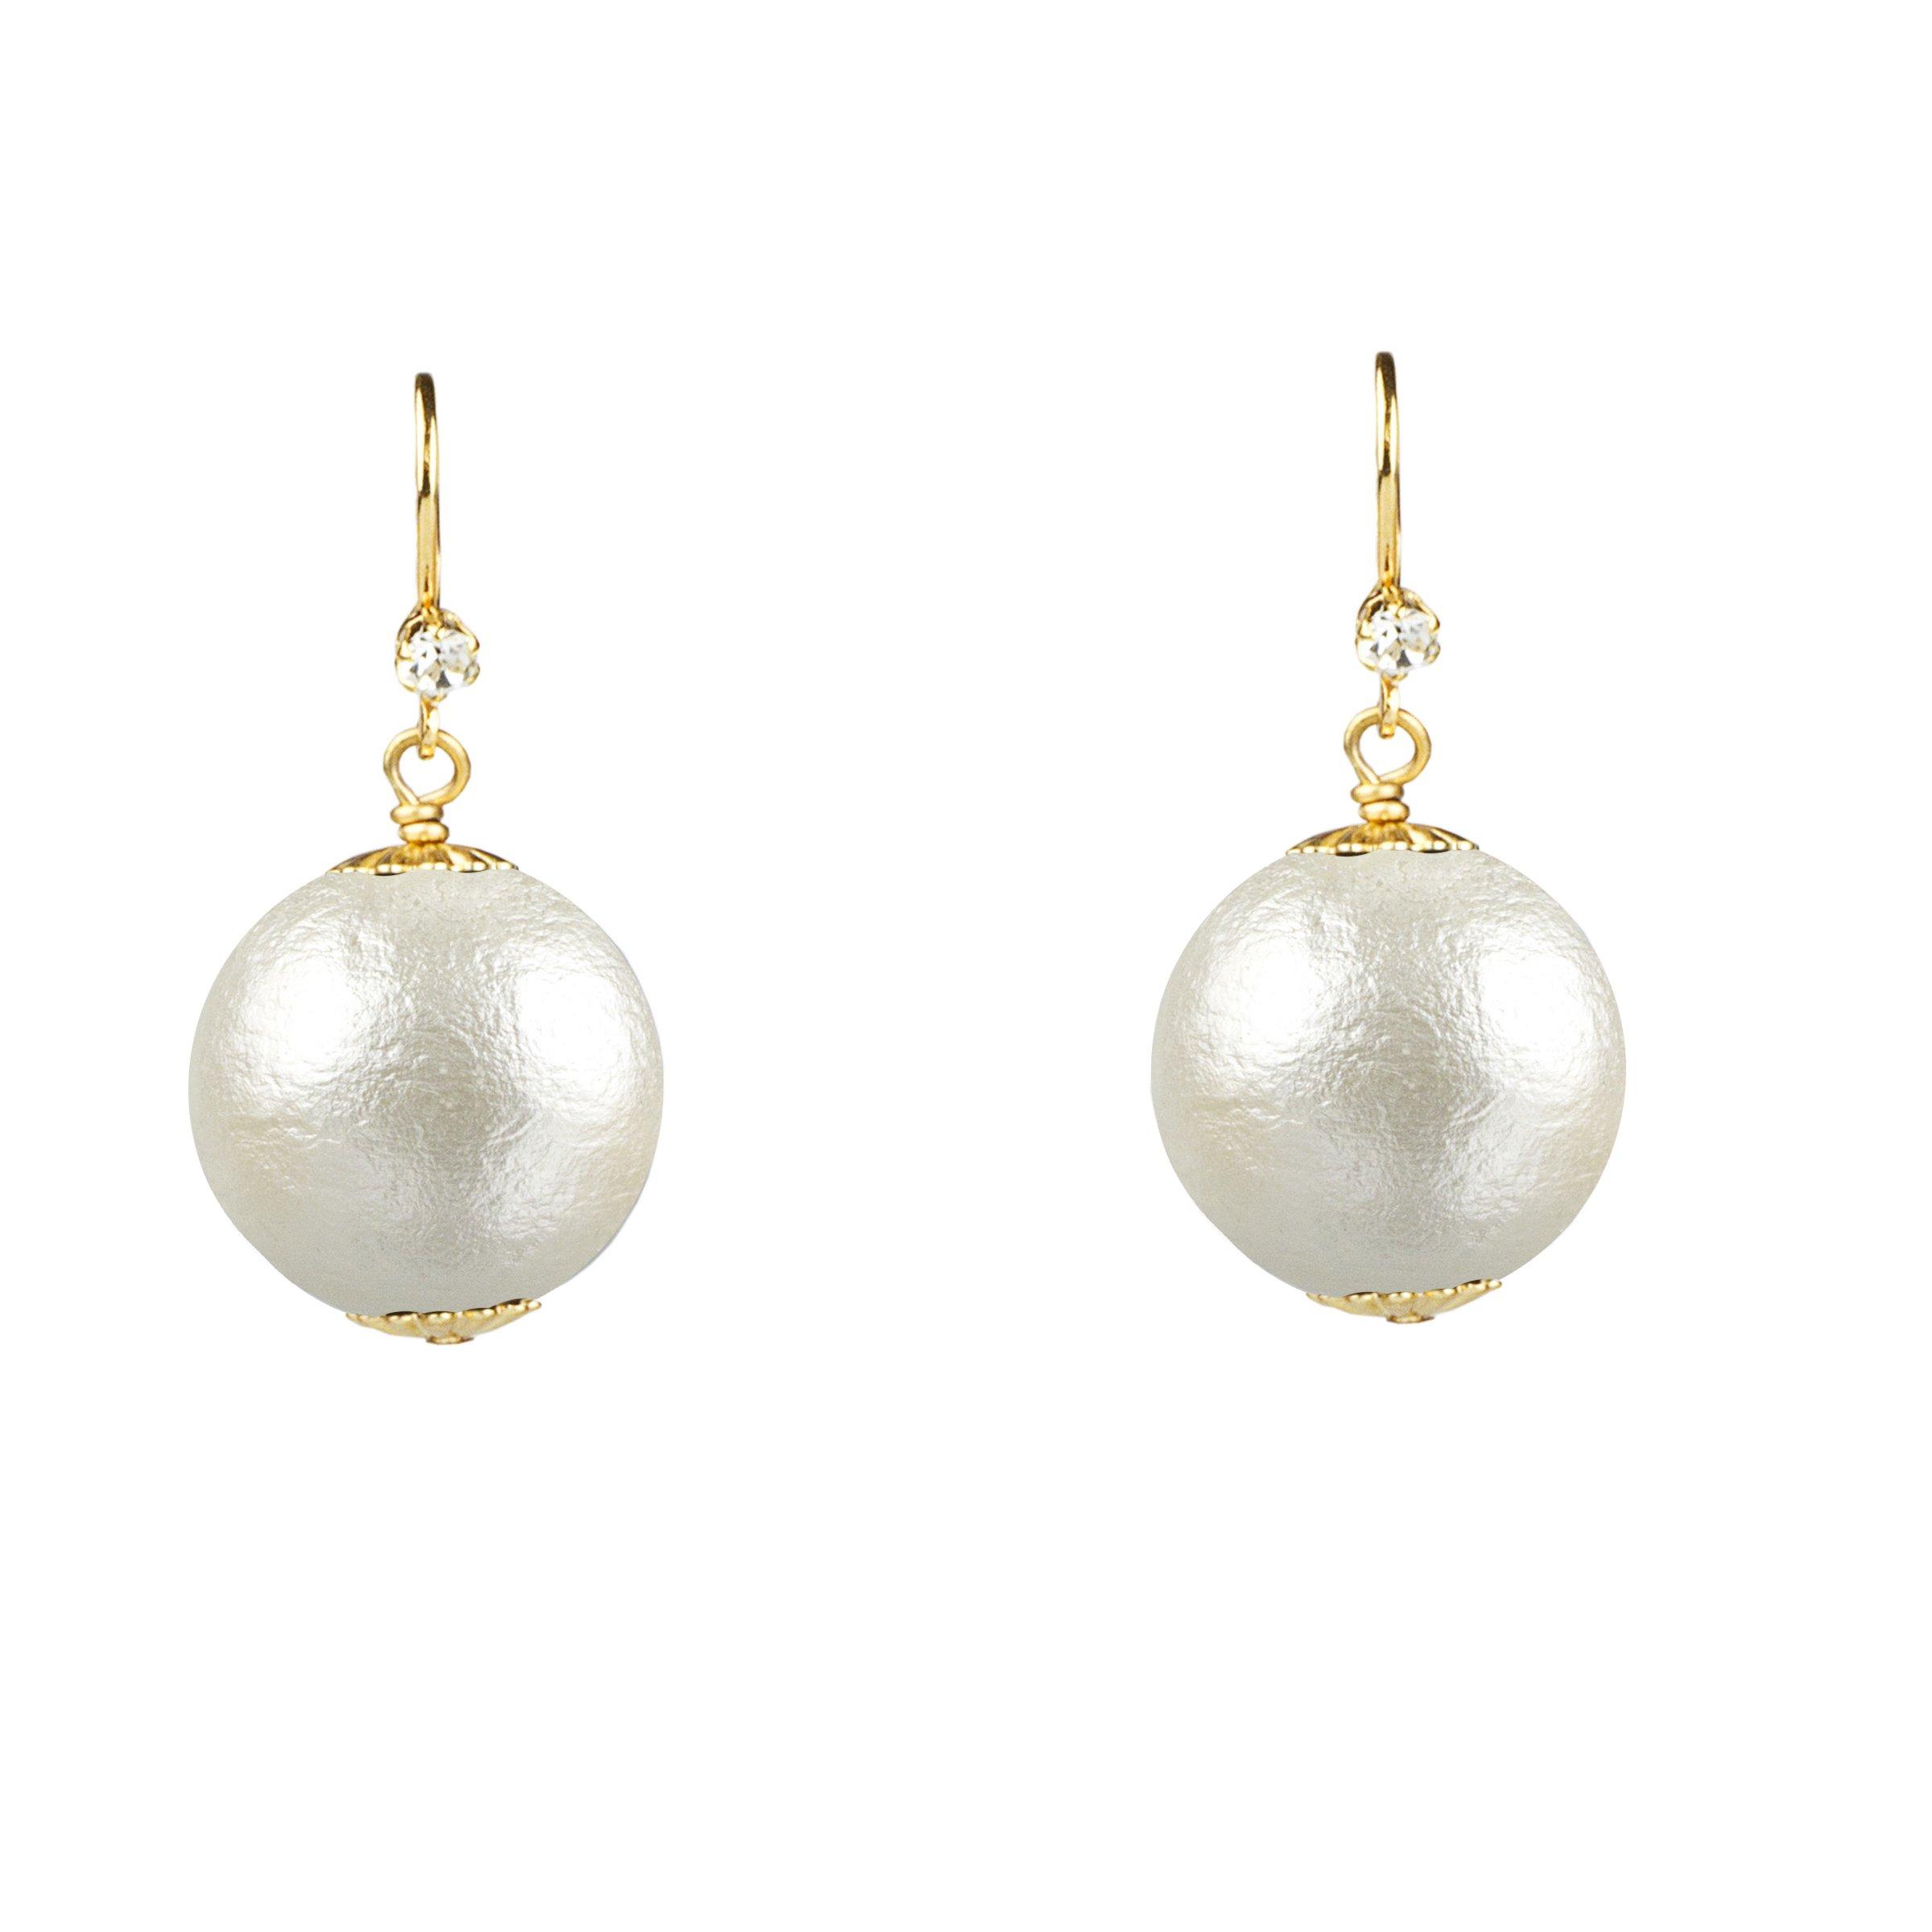 20mm John Wind White Cotton Pearl Earrings, Gold Tone